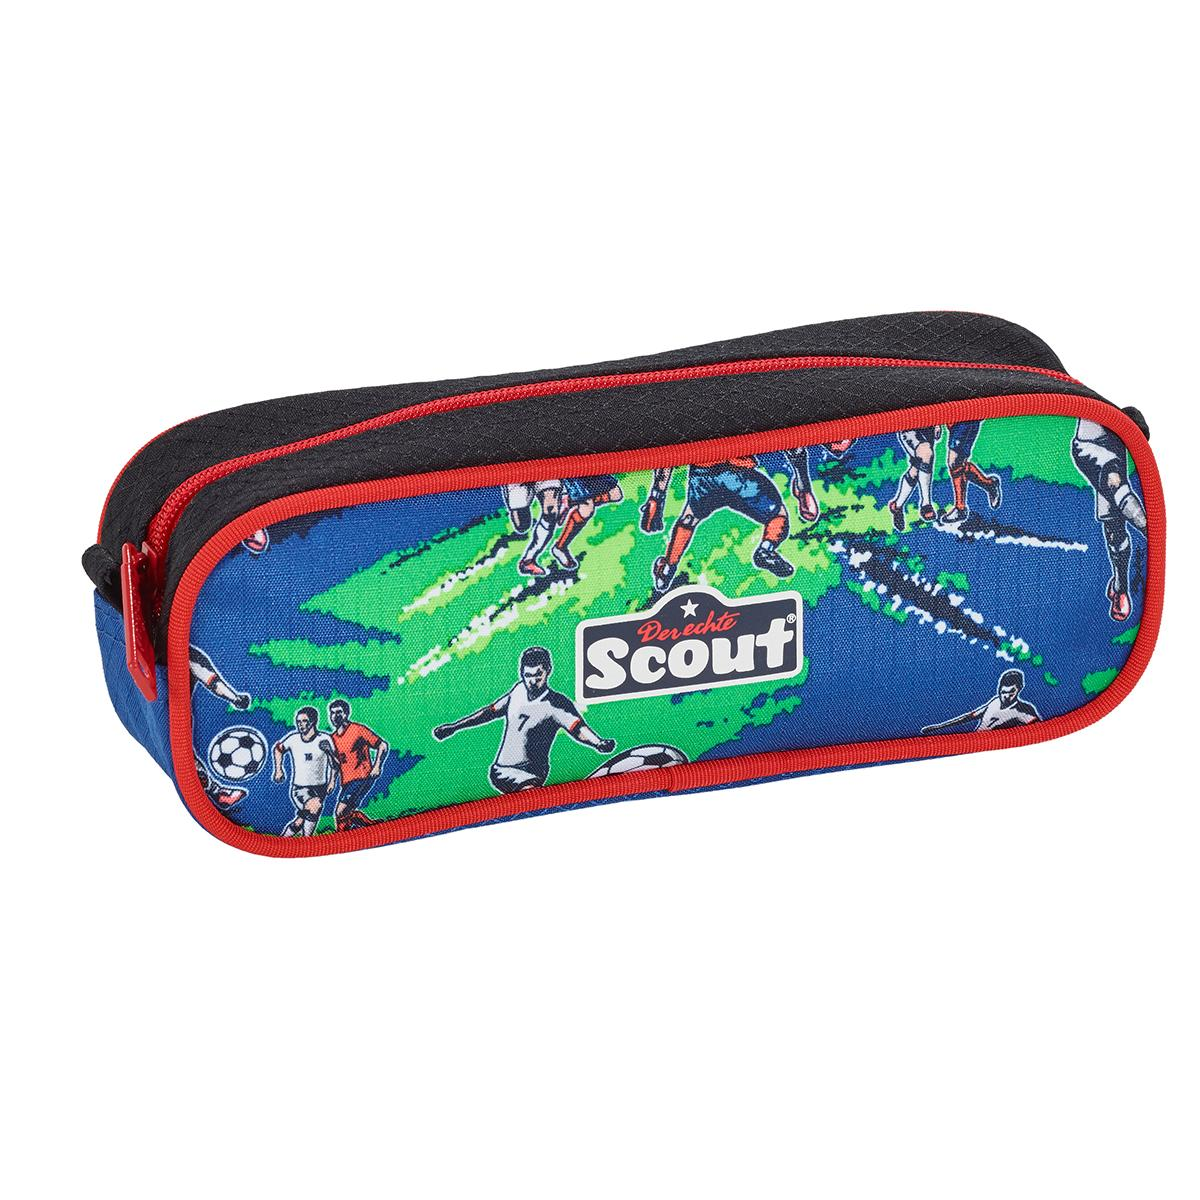 63a81faaba7e3 Scout Sunny 4-teiliges Set FB Team - Ordeo.de - Schulranzen ...